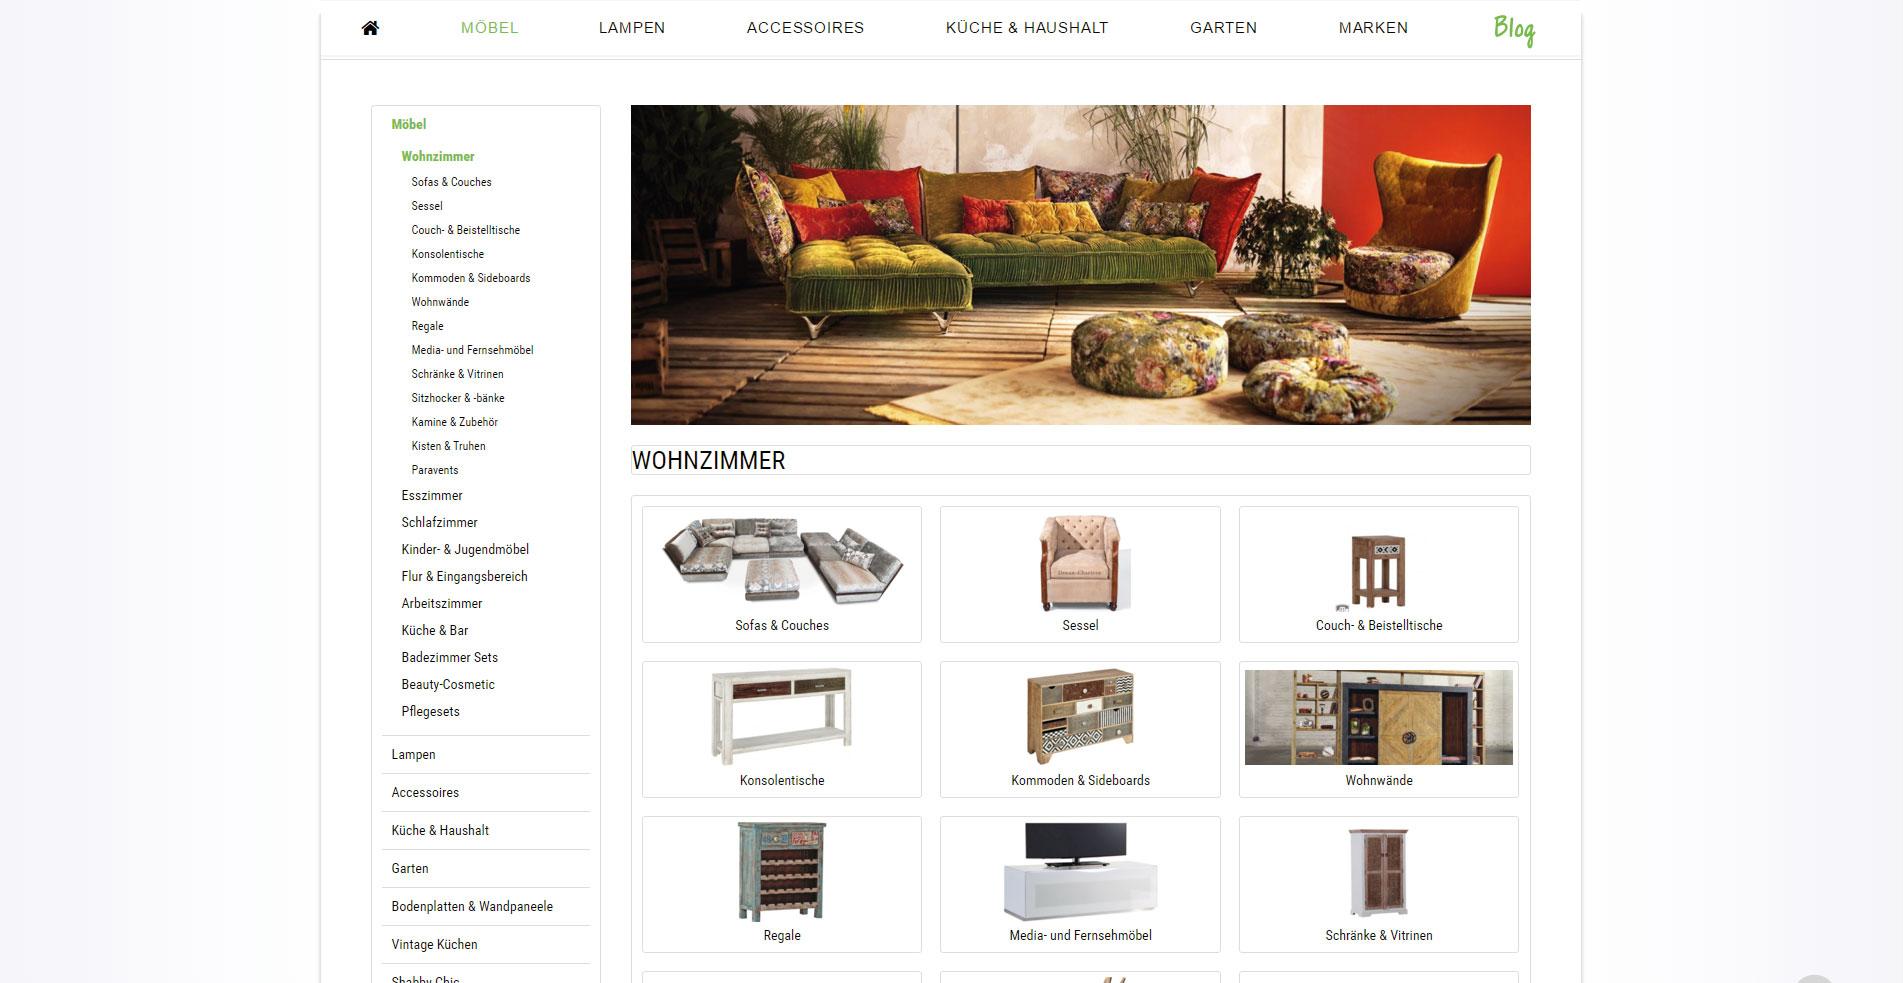 Design Möbel Lyssach Ag Kmudo Webshop Website Erp System